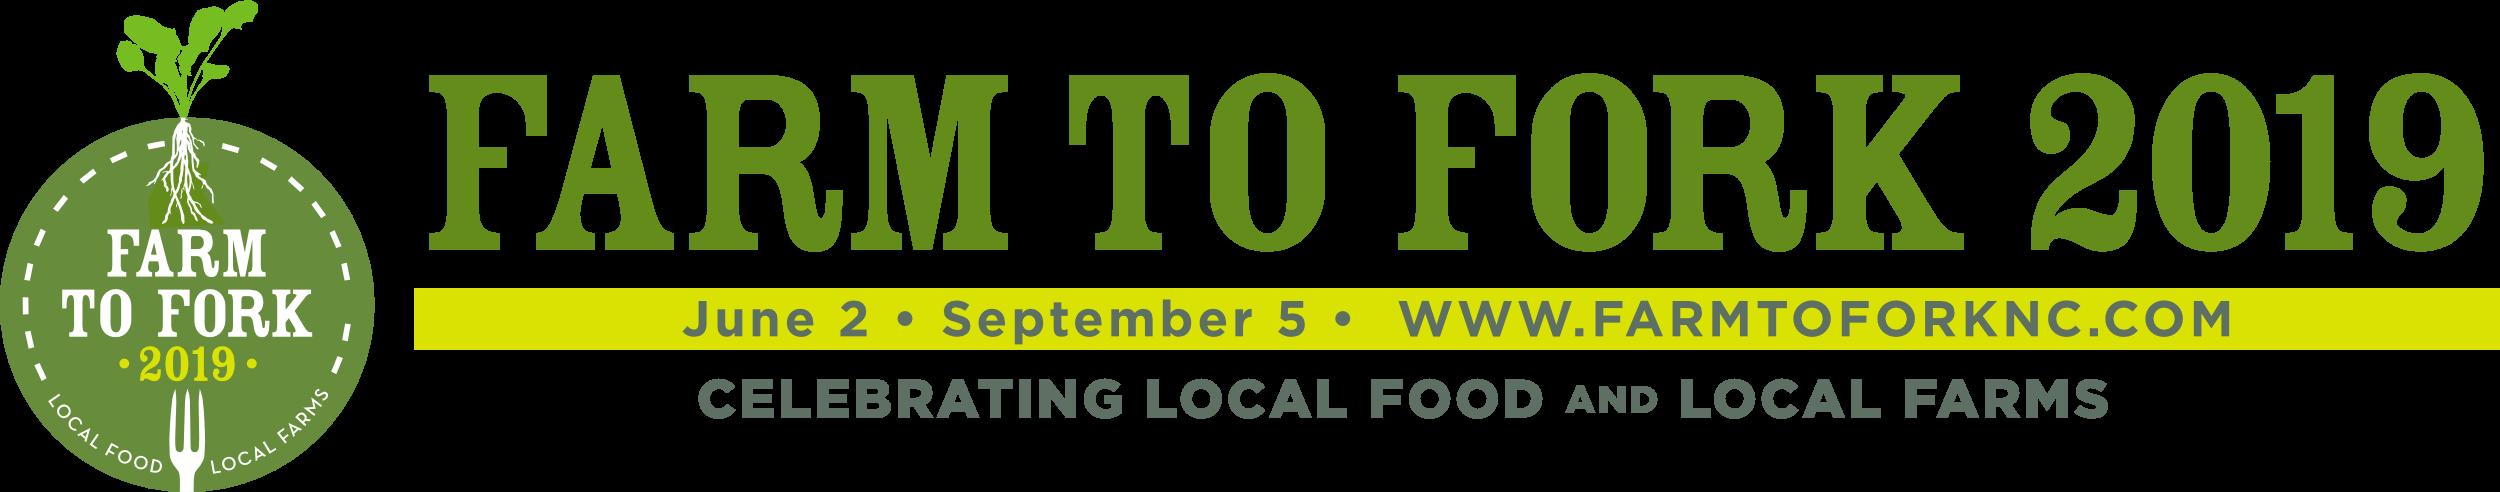 FTF-logo-2019.png#asset:10445